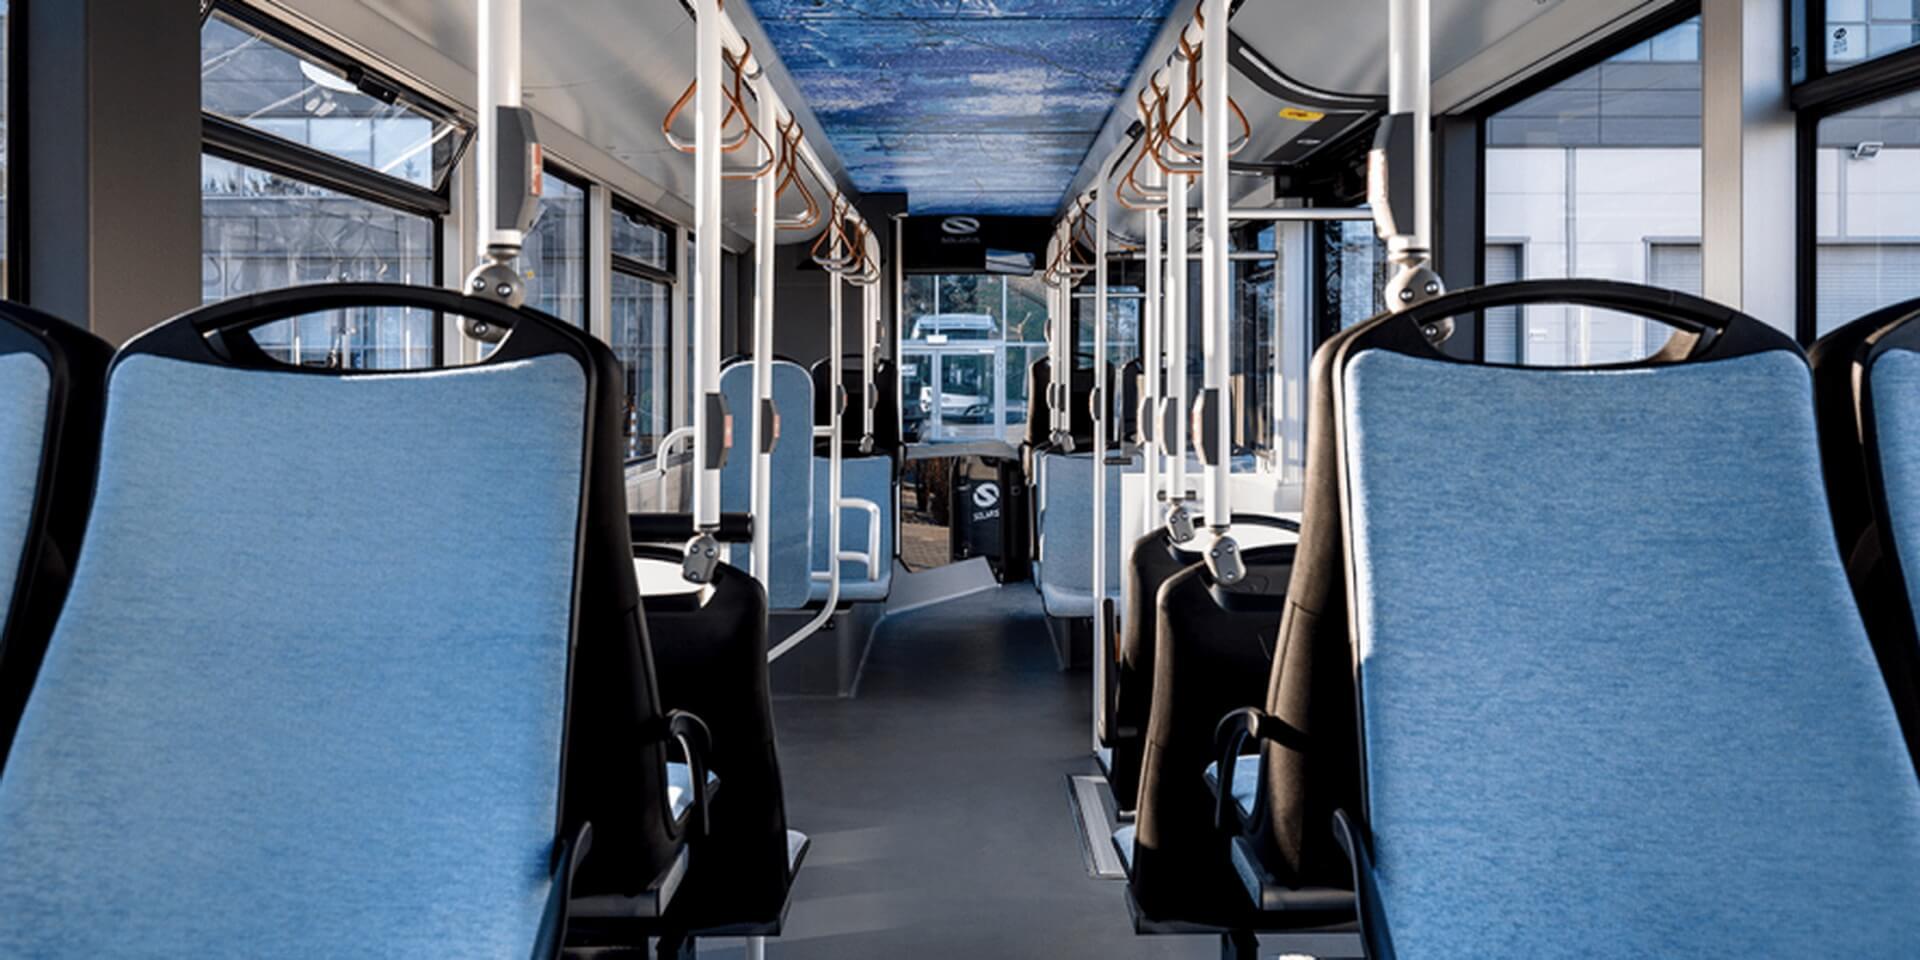 Салон водородного автобуса Solaris Urbino 12